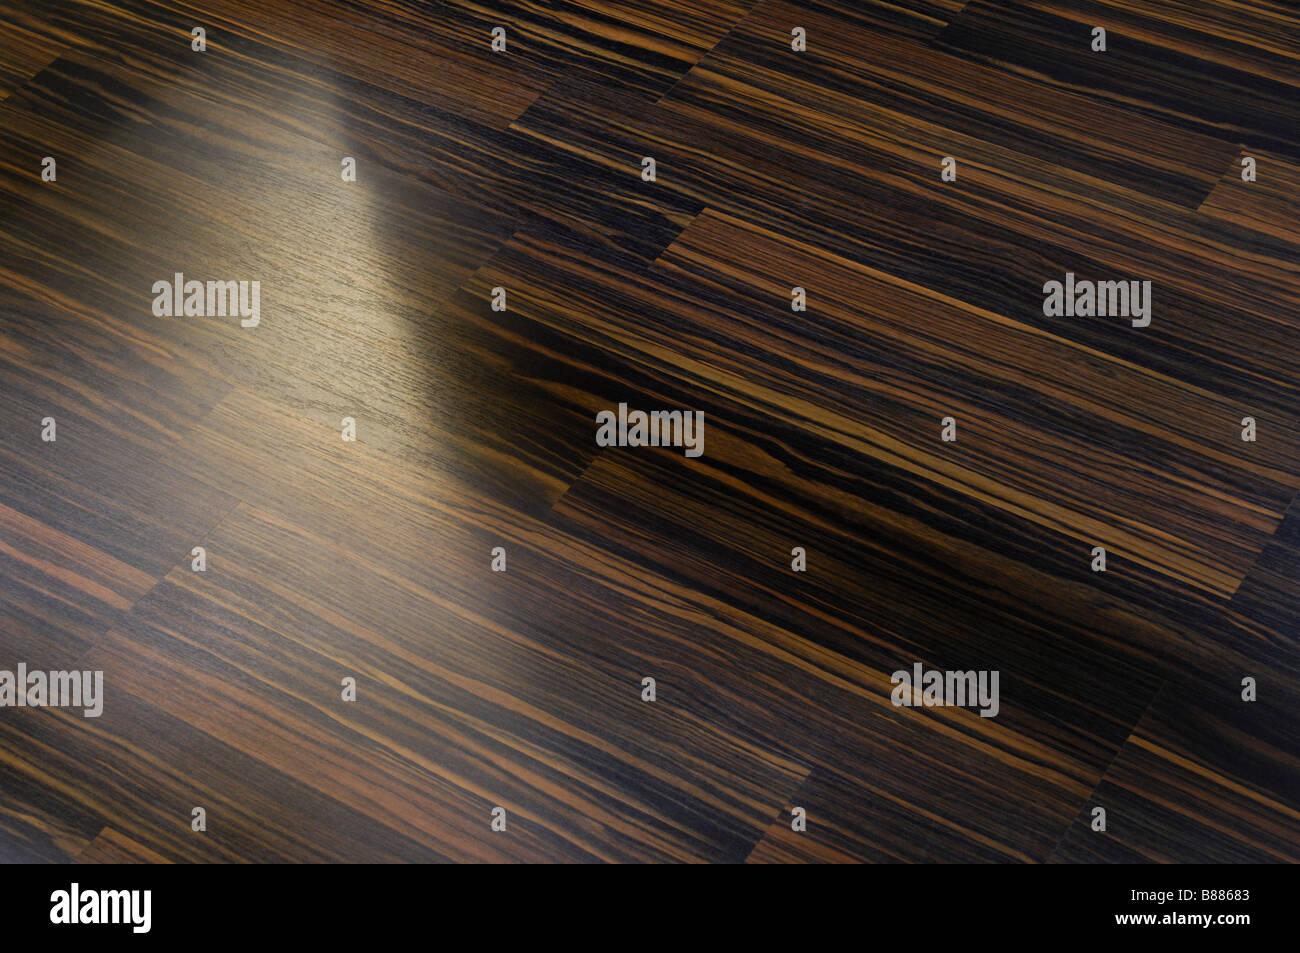 Laminated floor - Stock Image